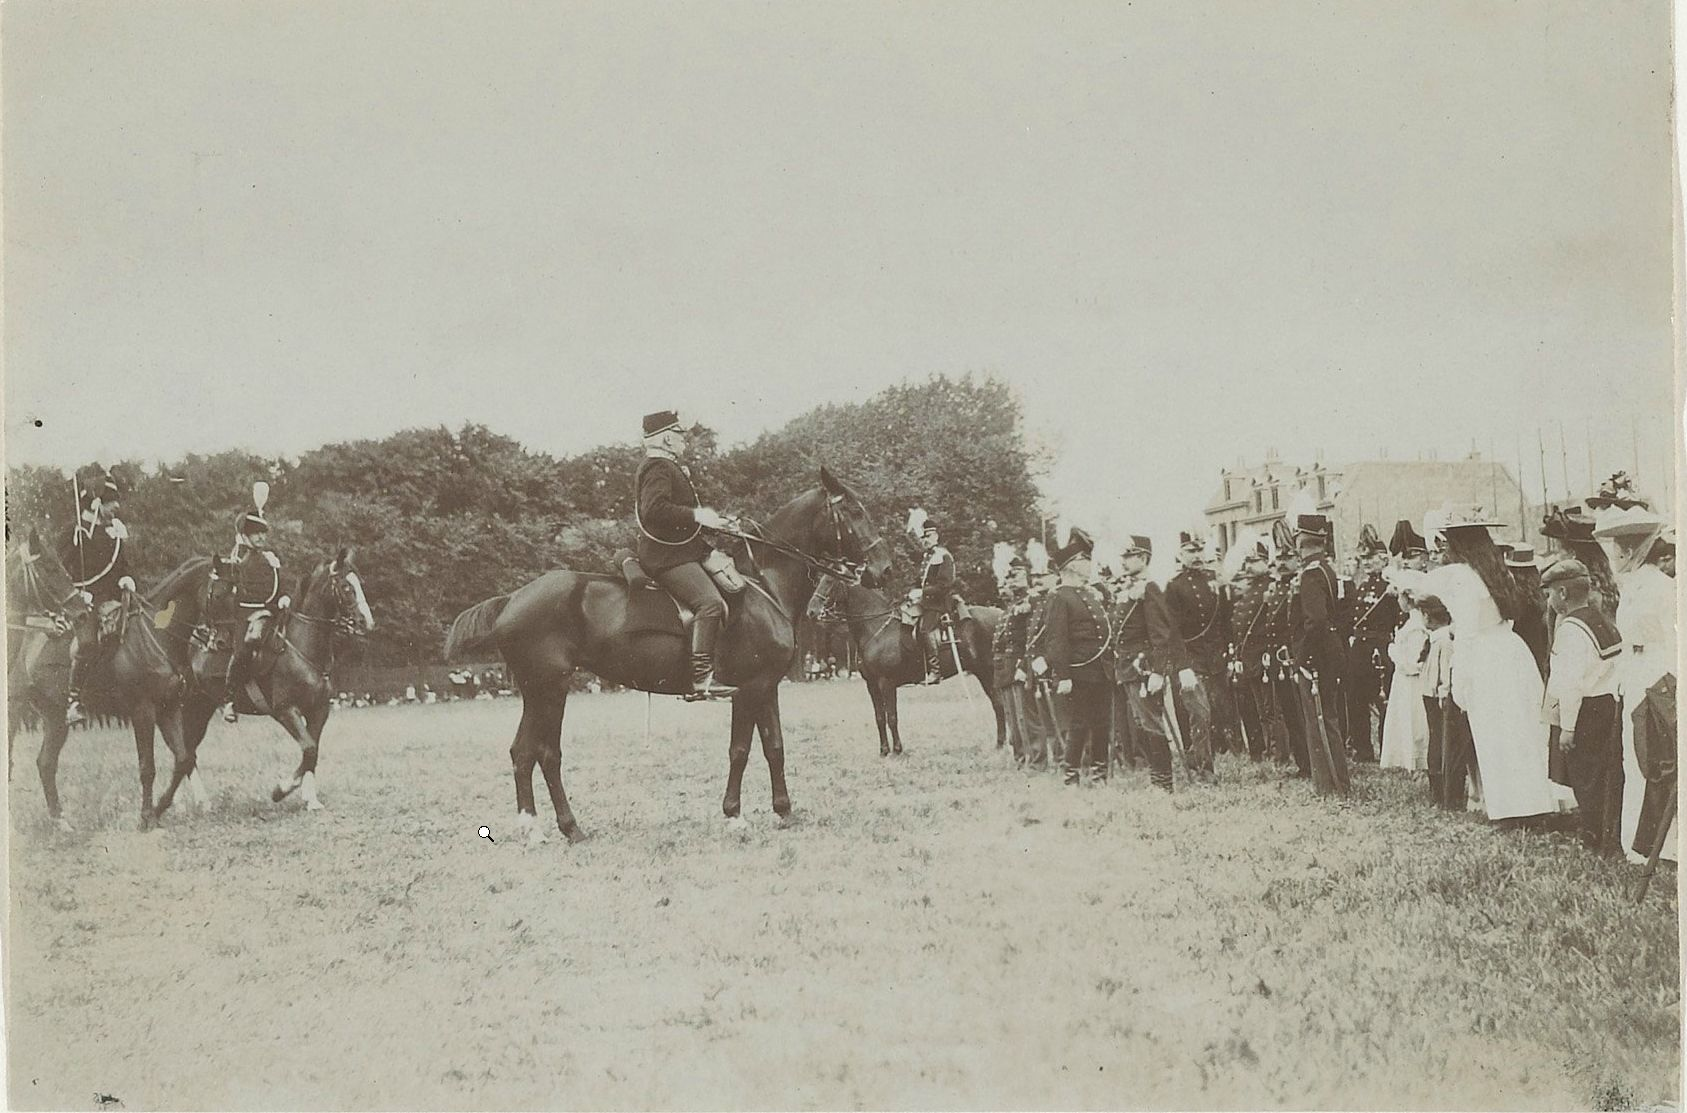 De cavalerie van de Ripperda kazerne